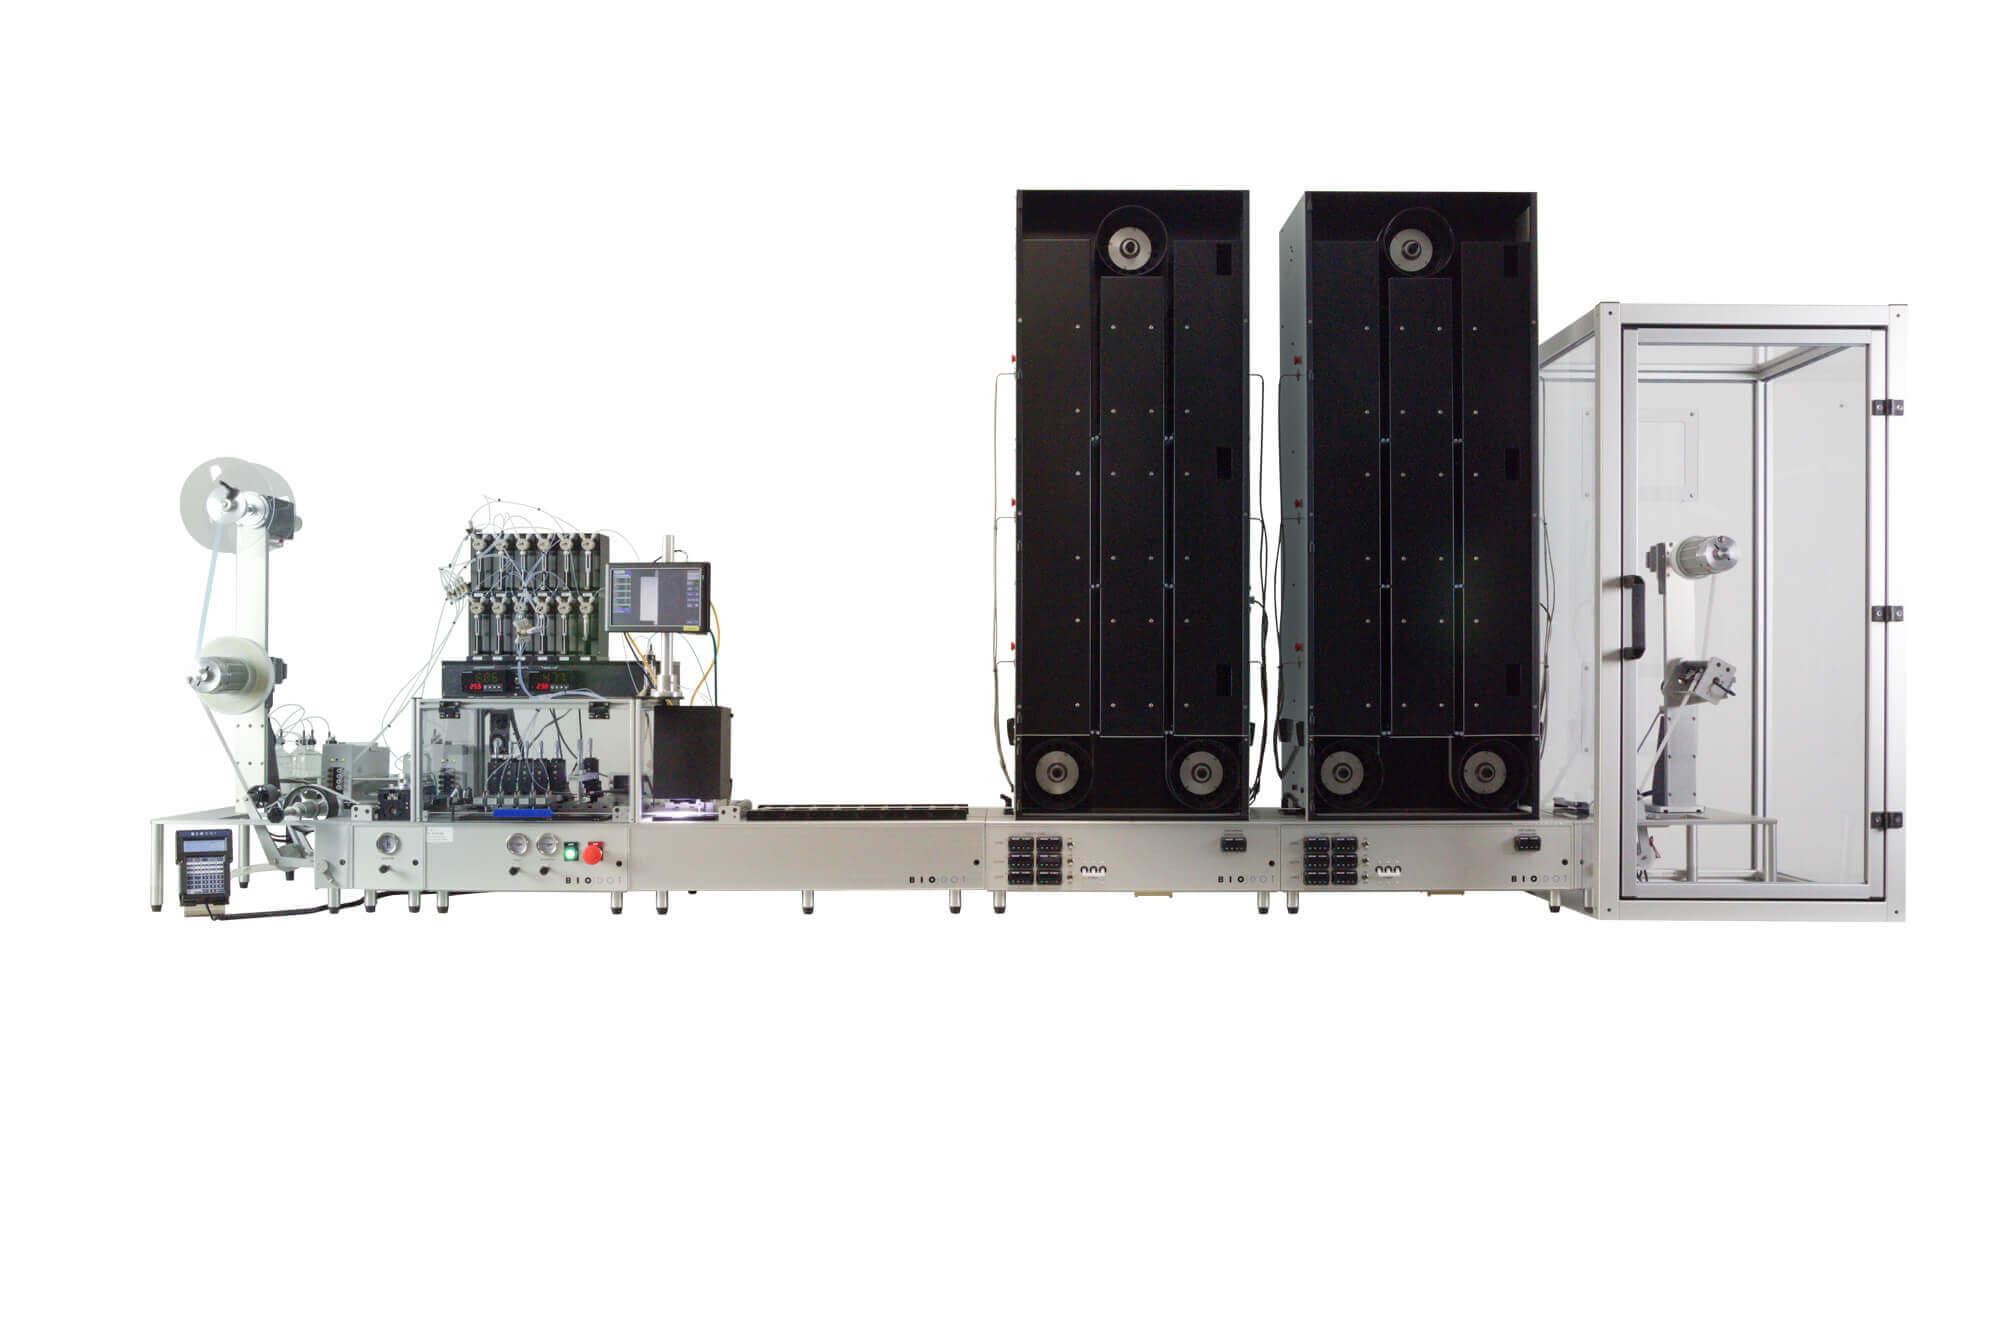 RR120™ Web Handling System